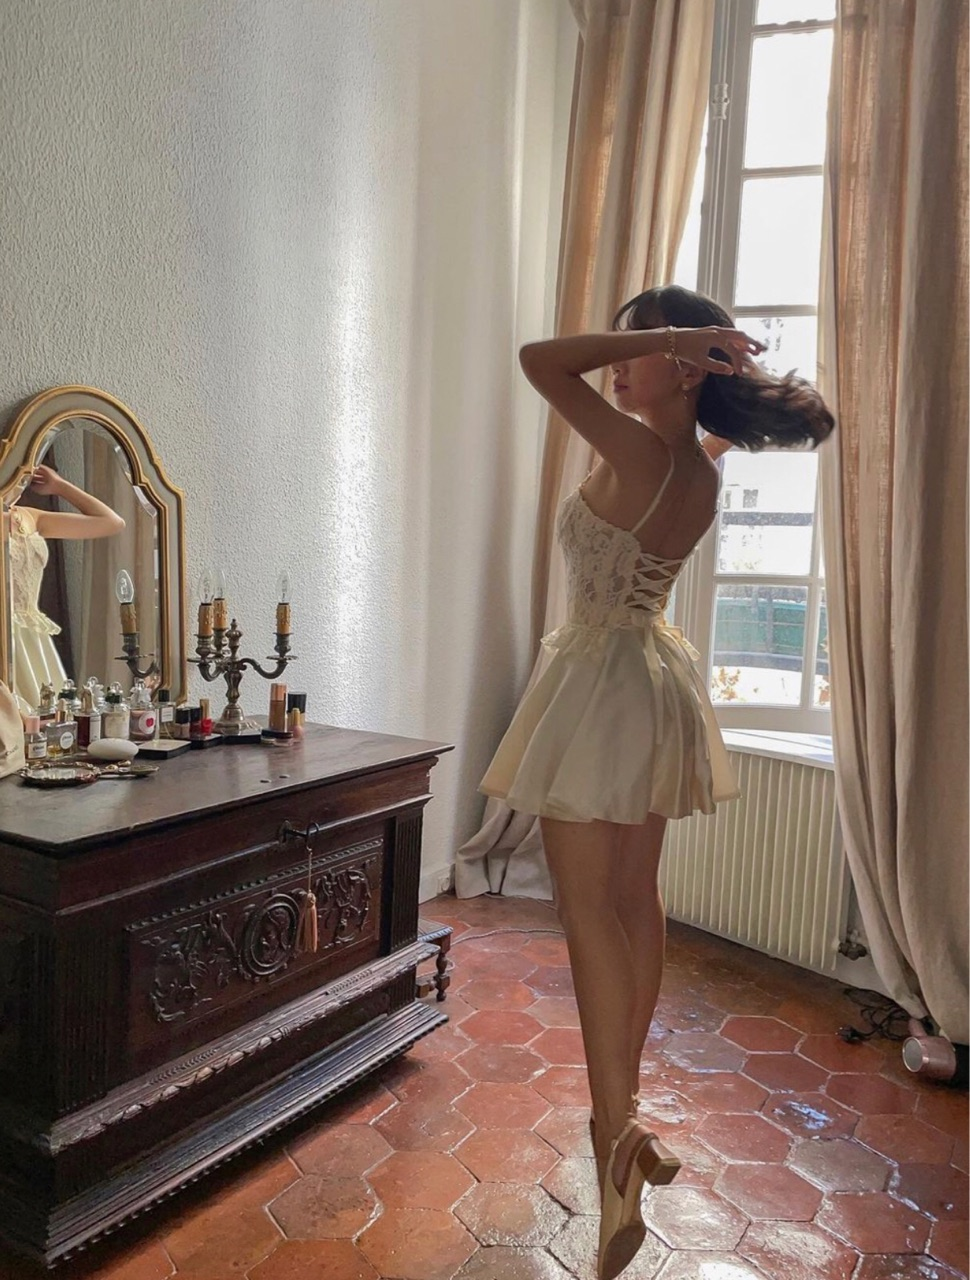 Image by borzoi